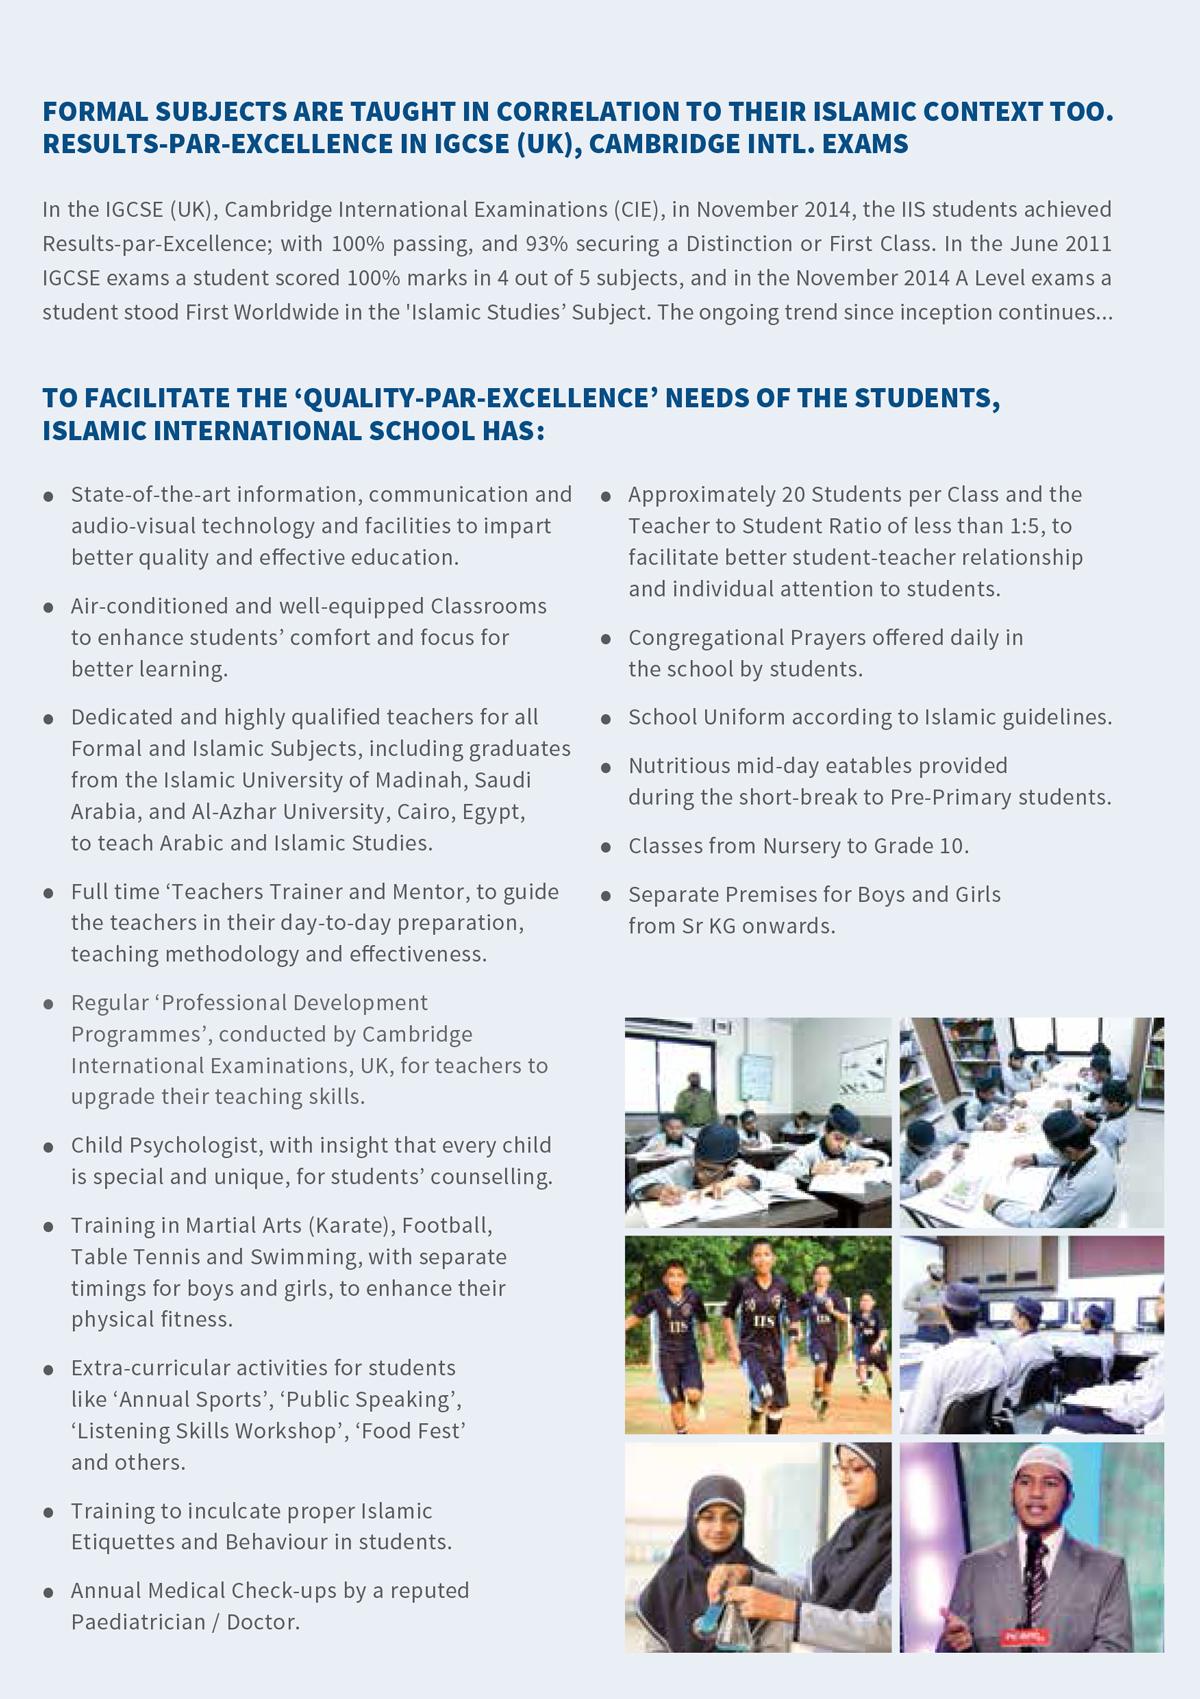 Brochure of Islamic International School (IIS) & Junior College